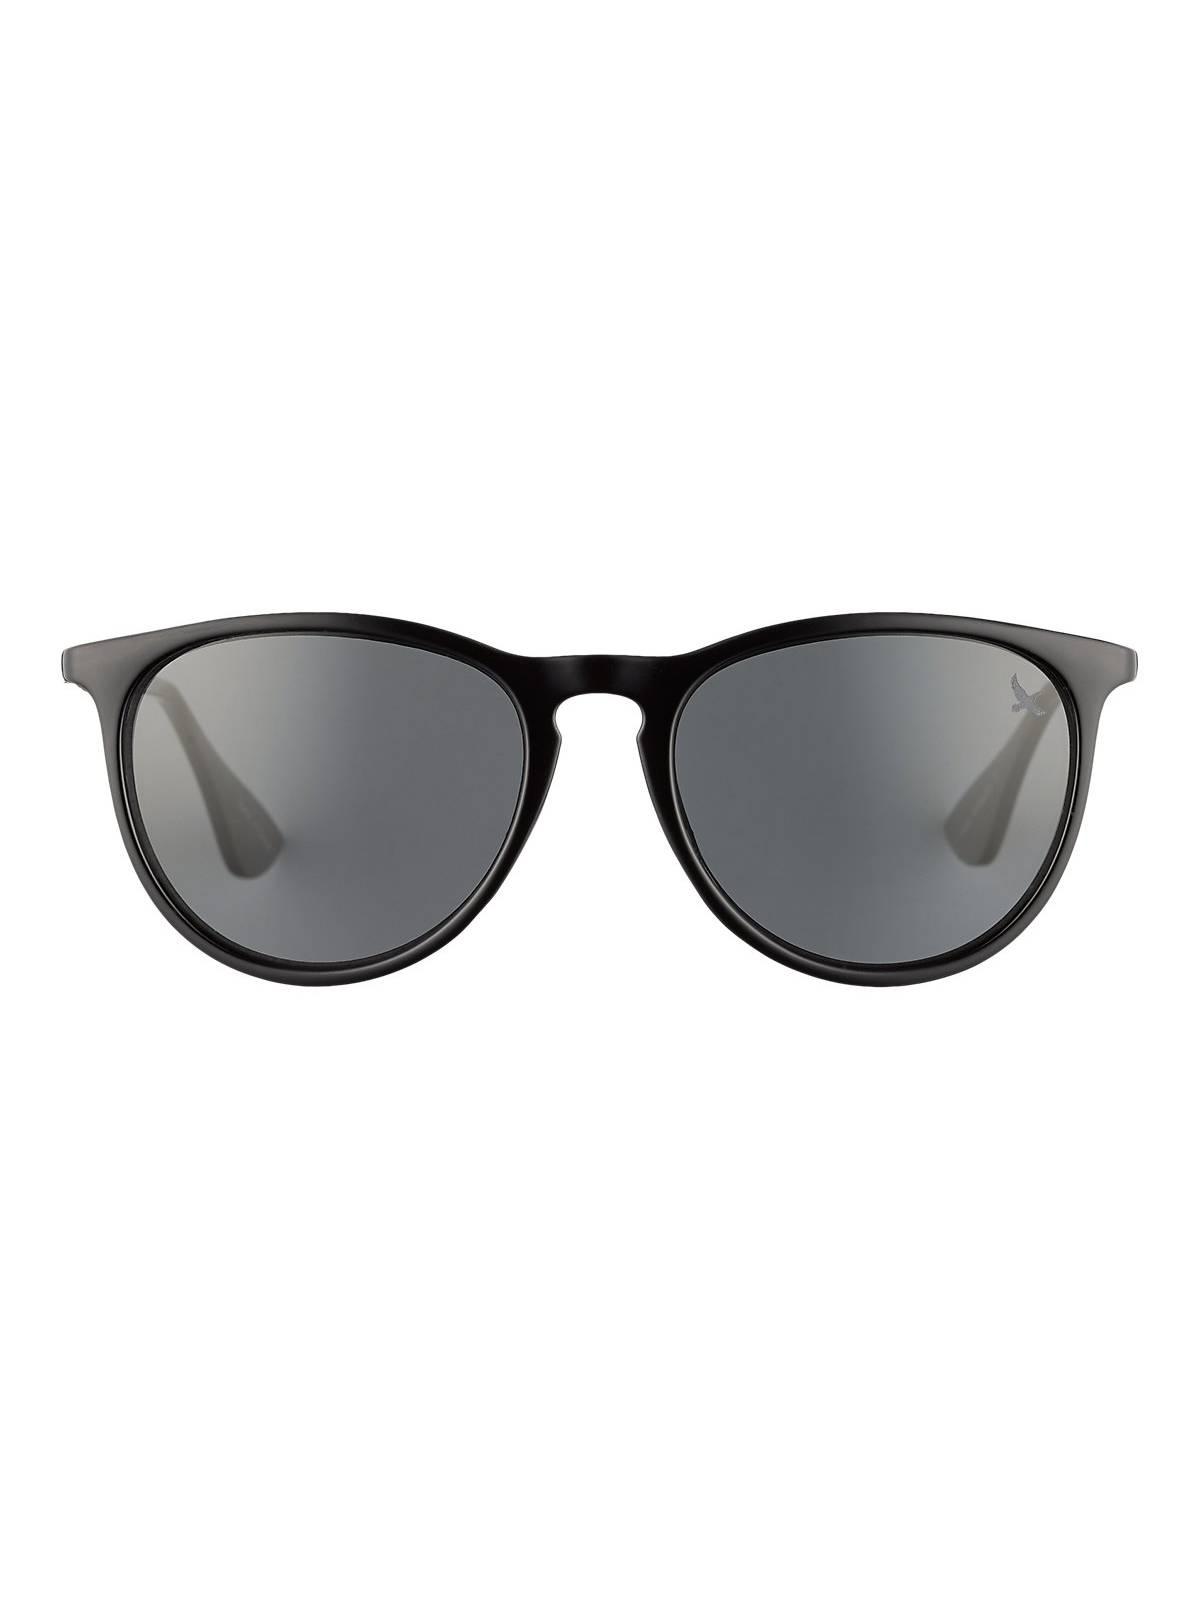 91338272b433 Eddie Bauer Unisex-Adult Montlake Polarized Sunglasses